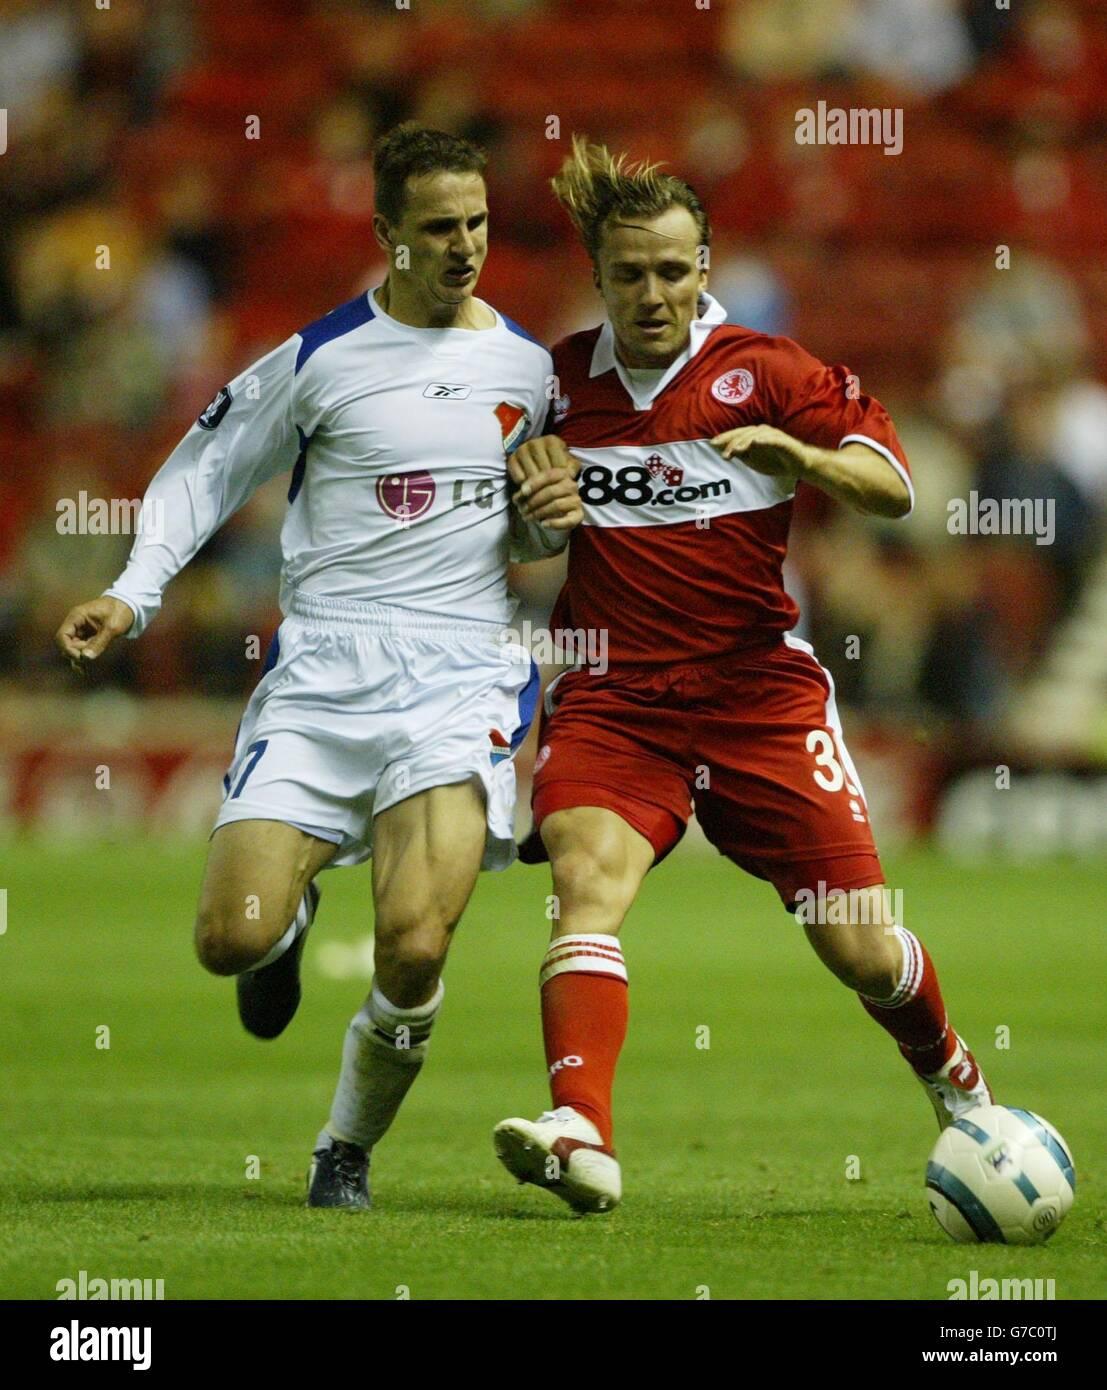 Middlesbrough v Banik Ostrava - Stock Image